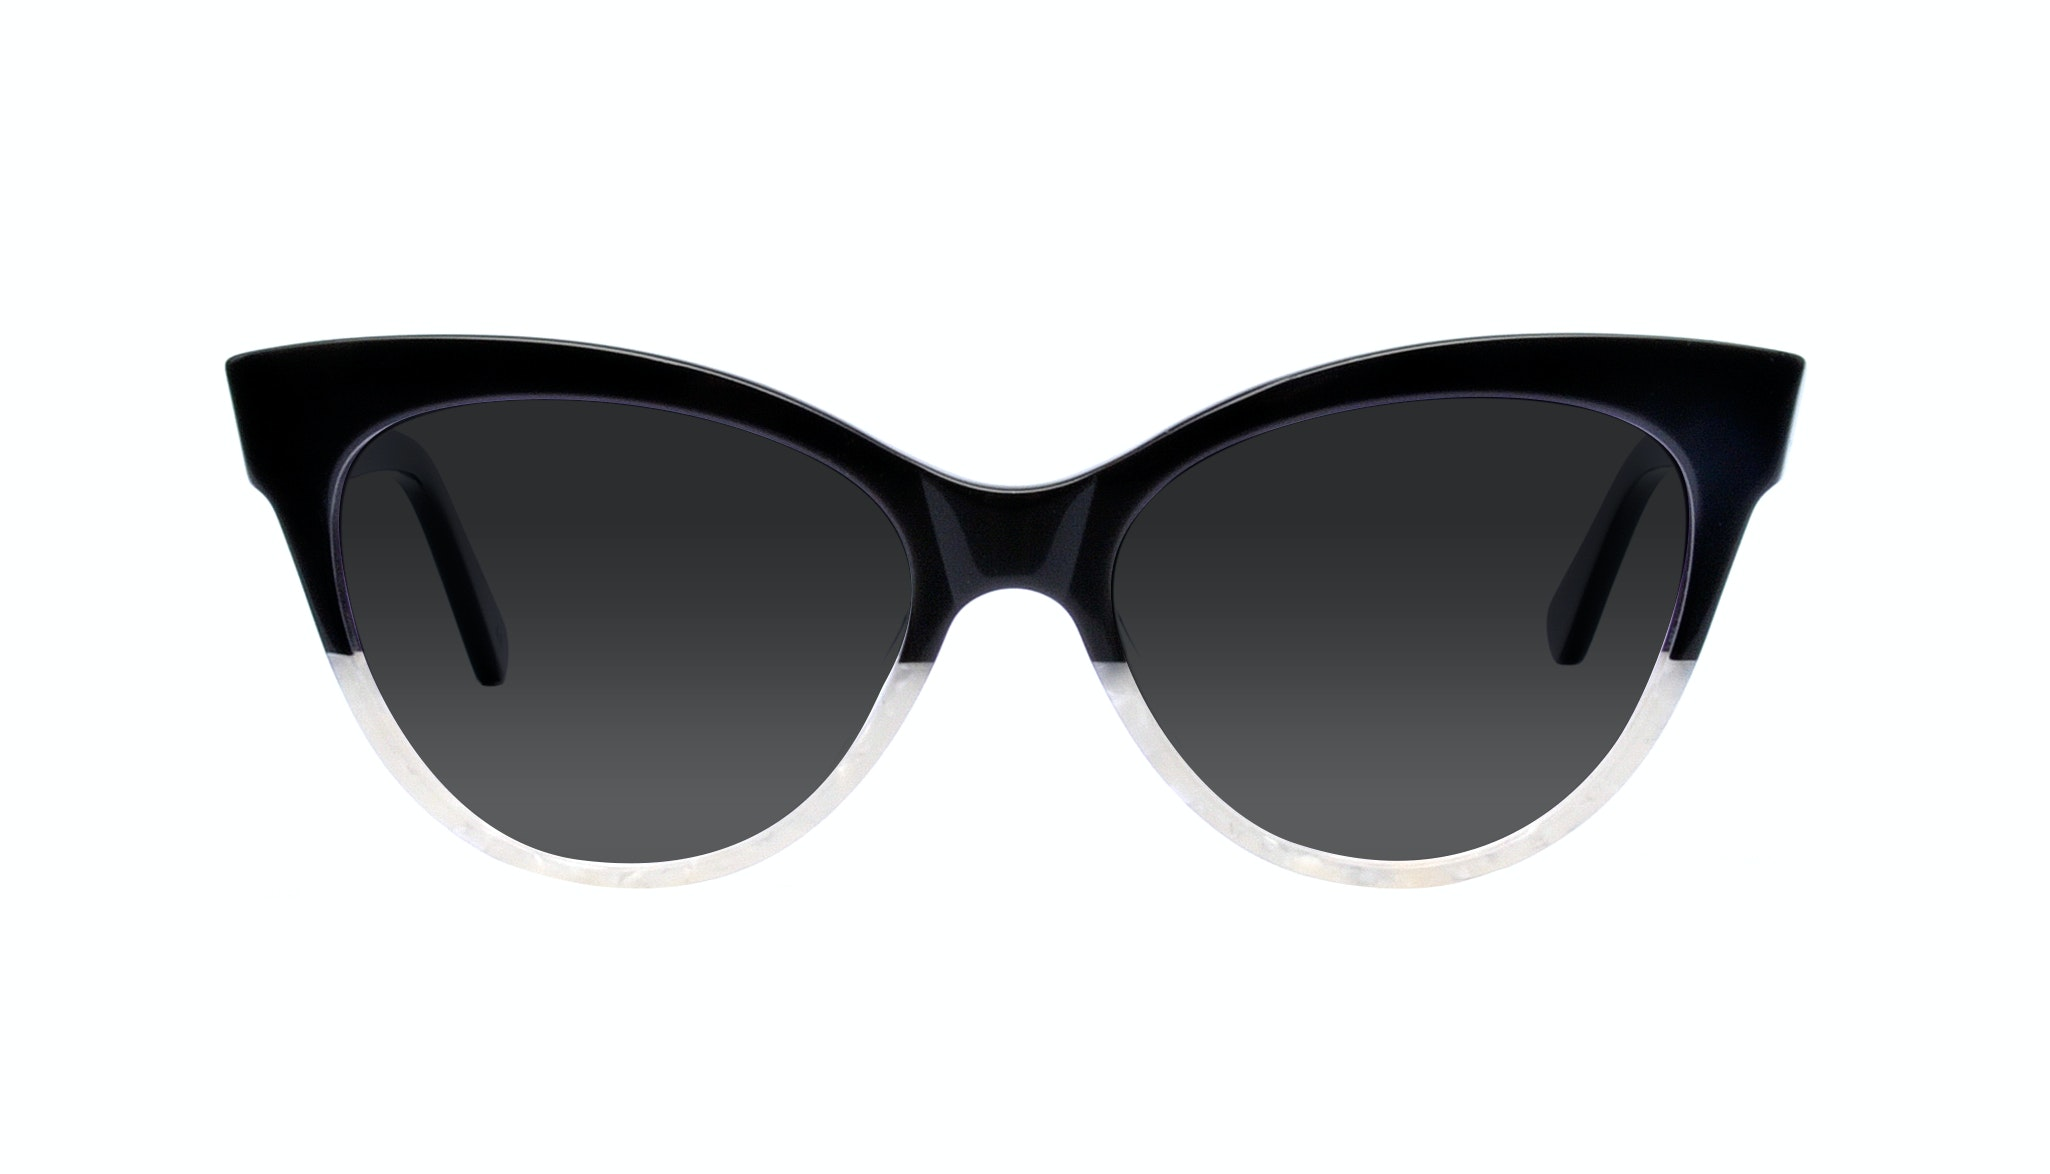 Affordable Fashion Glasses Cat Eye Daring Cateye Sunglasses Women SkunkBoy Panda Pearl